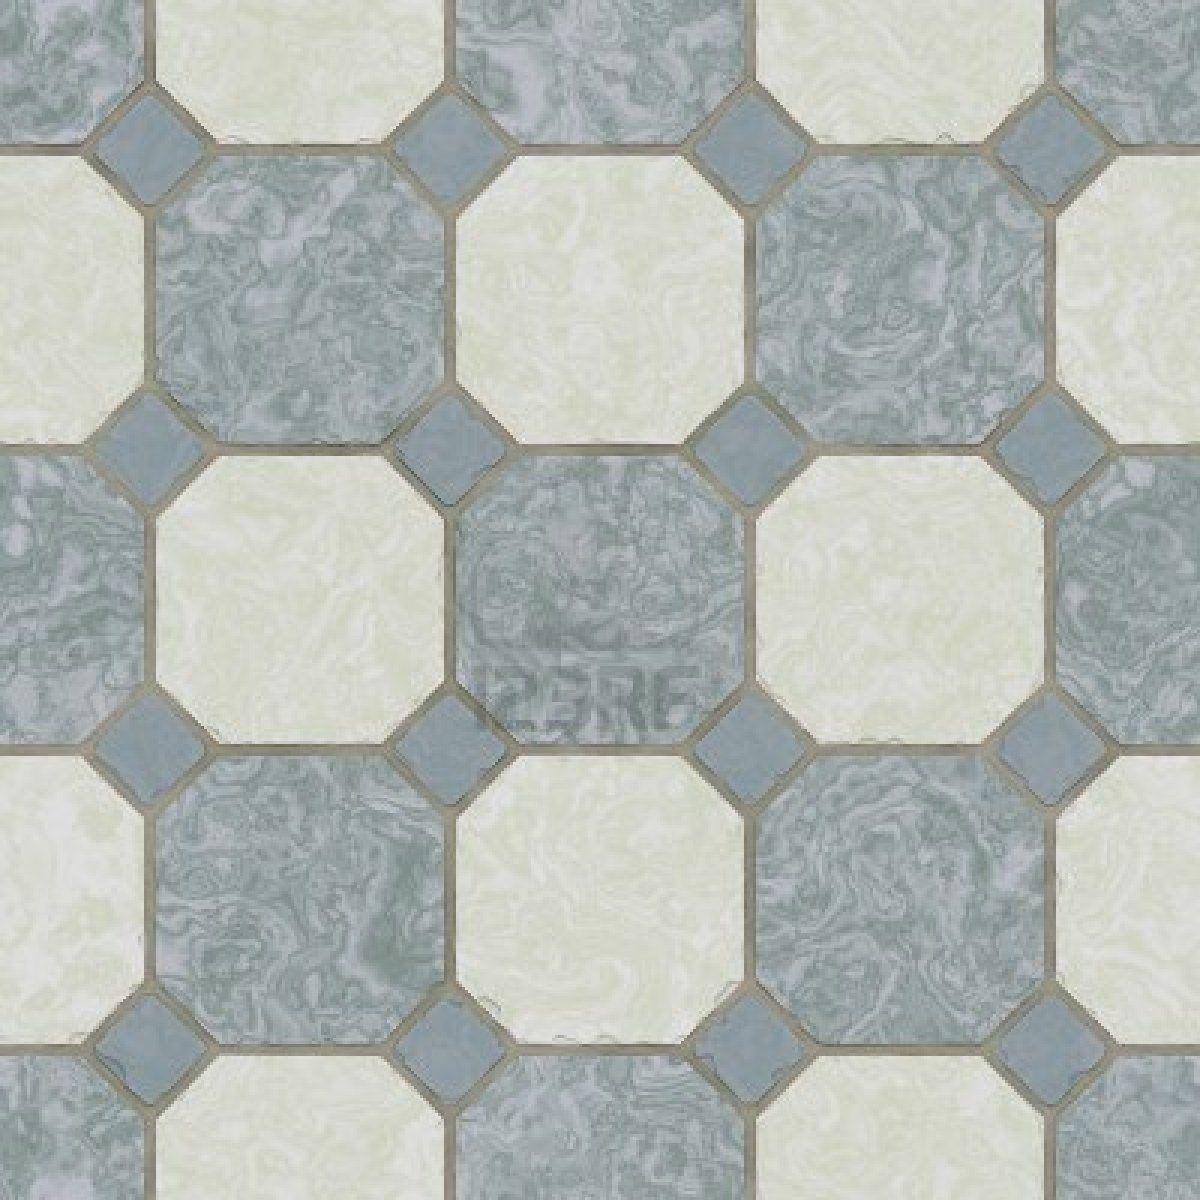 Ceramic Tile Kitchen Floor Seamless Texture Blue Tiles Kitchen Floor Tile Removable Wallpaper